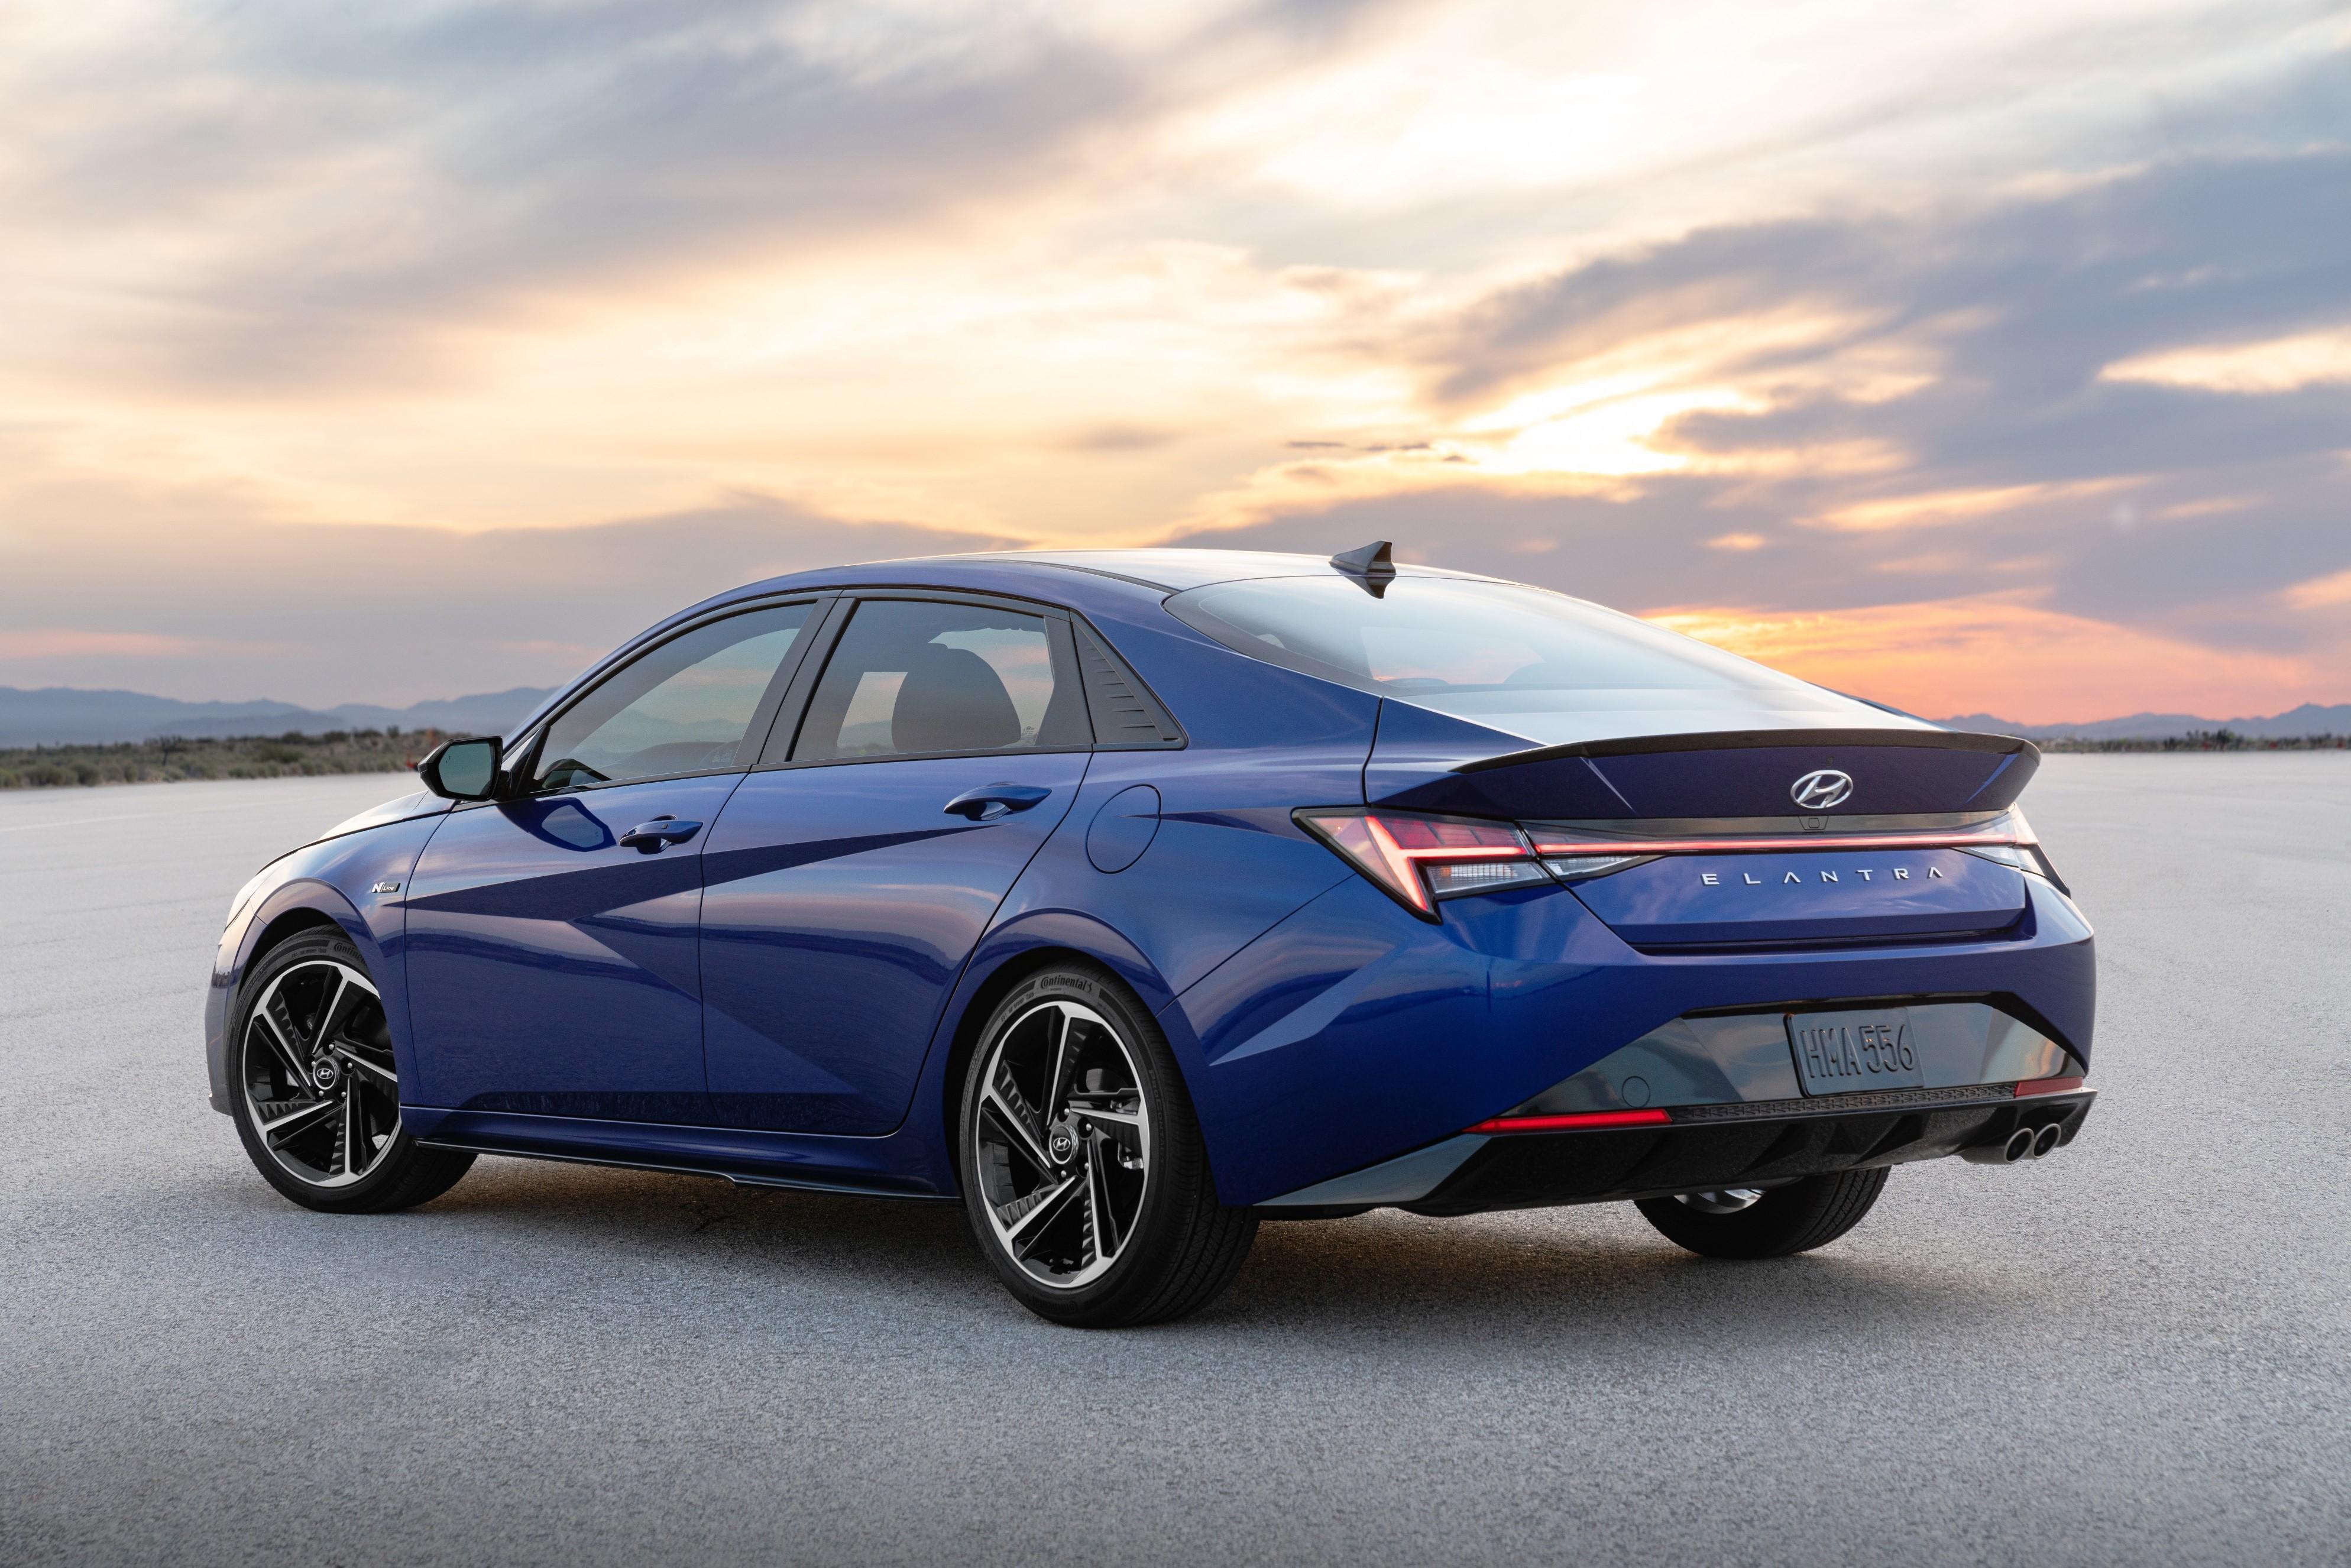 2021 Hyundai Elantra N Line Rolls Out, Sports Sedan Packs ...